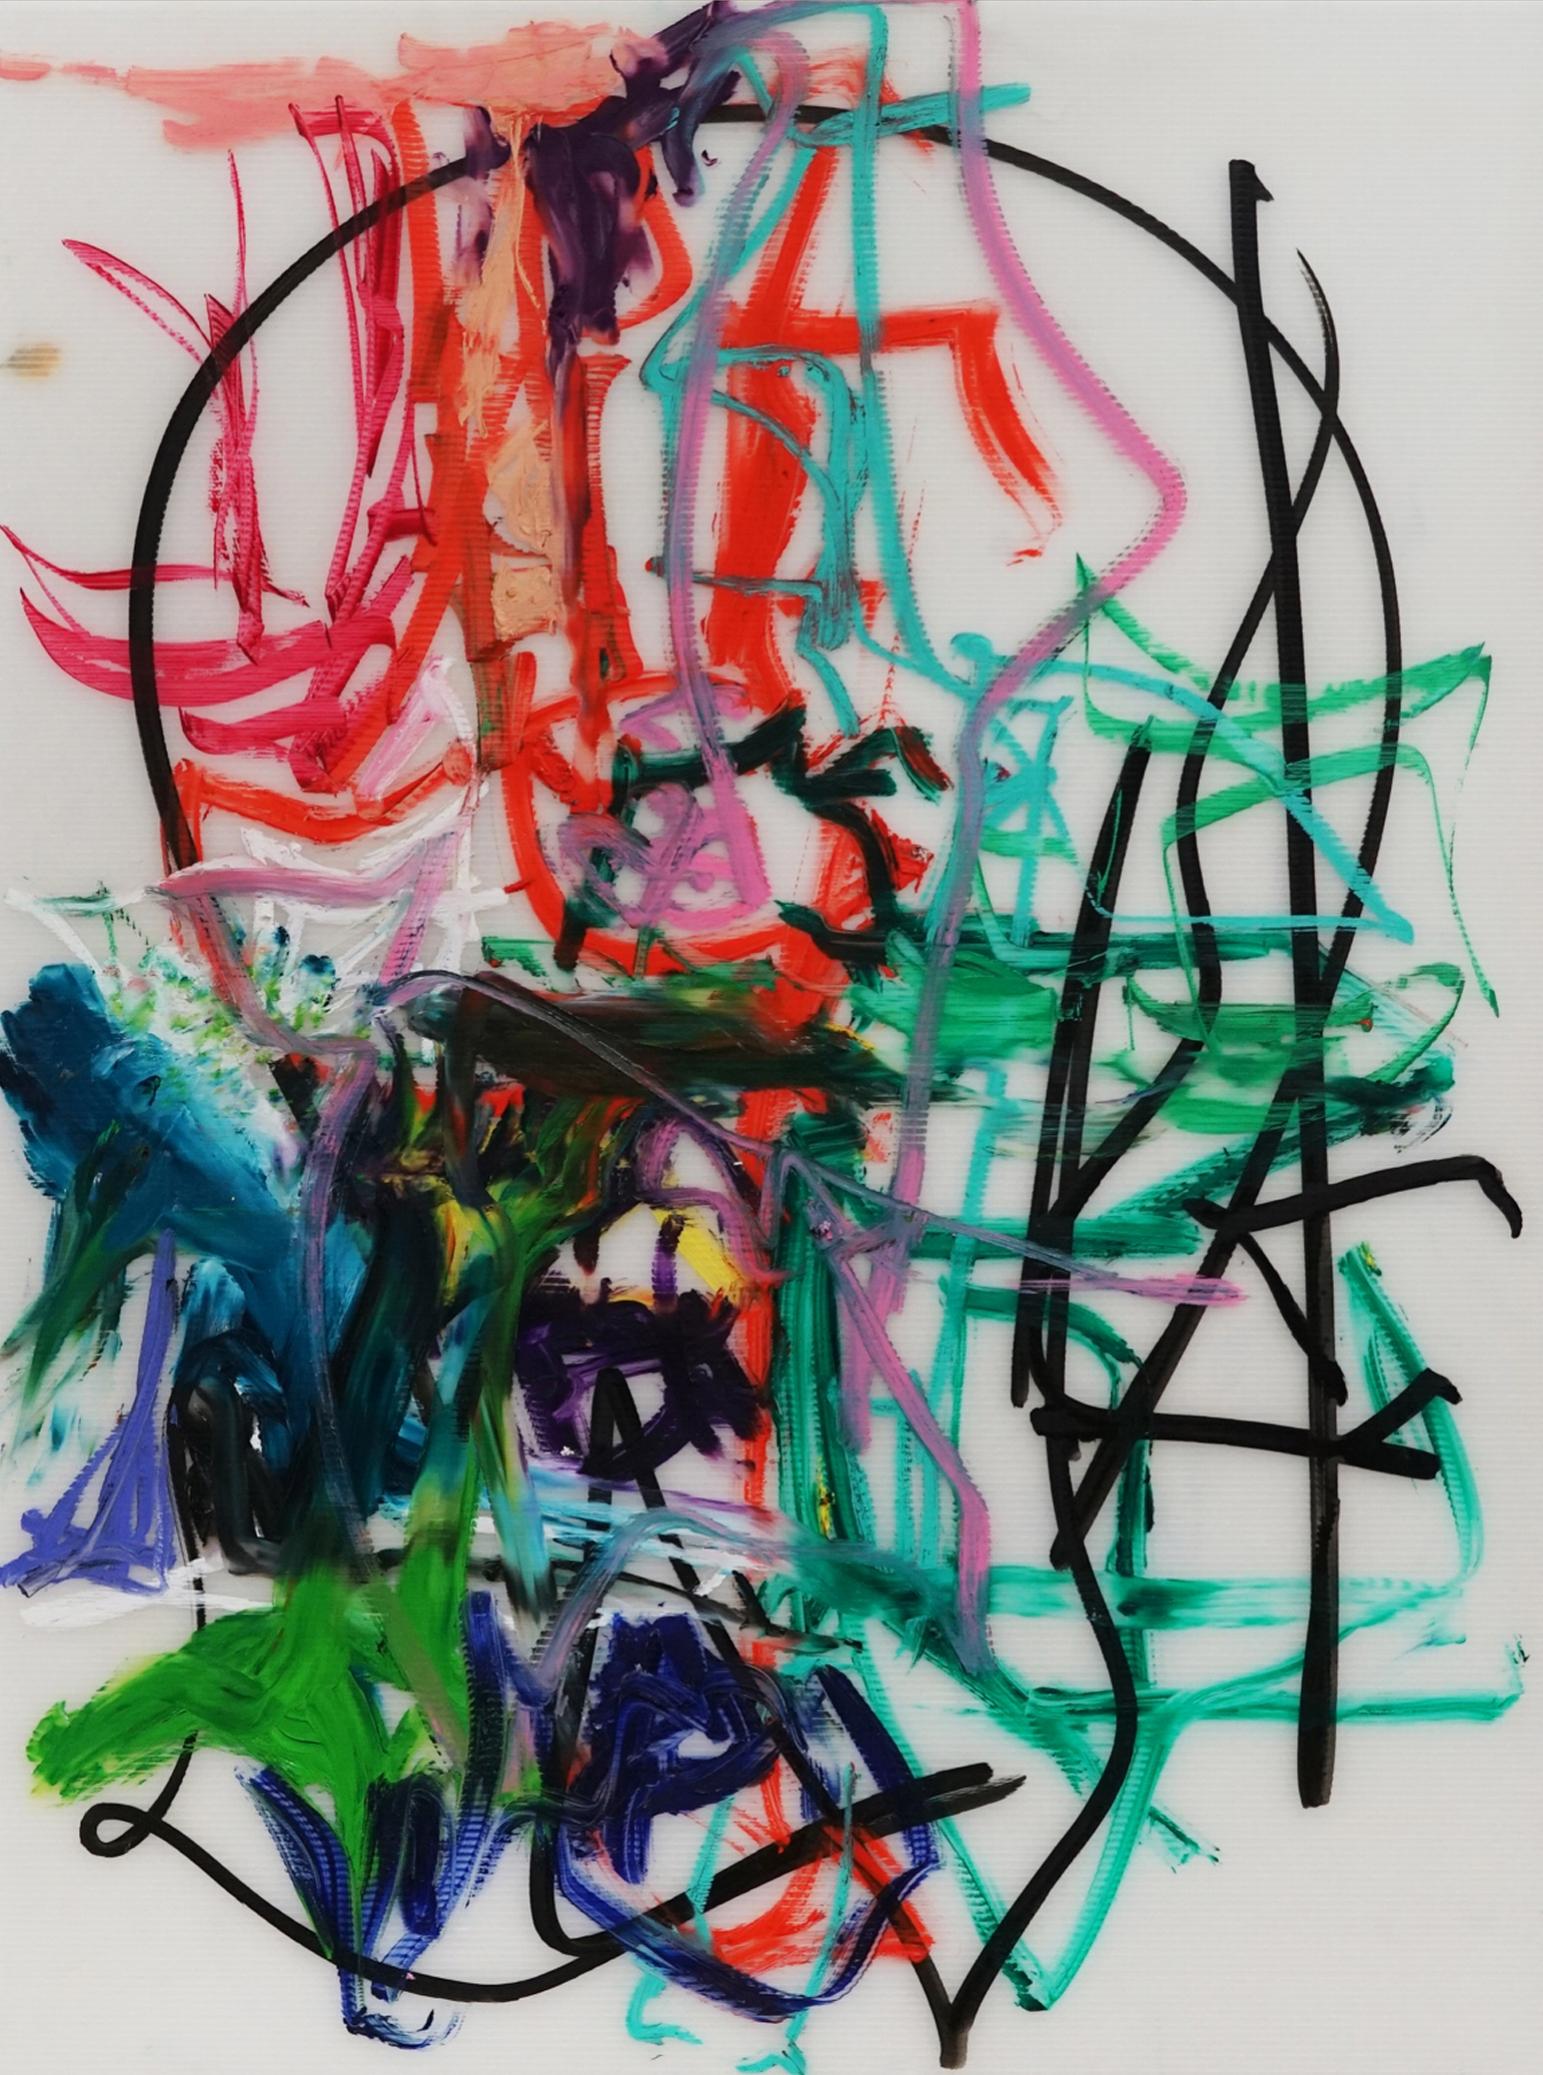 Aaron Garber-Maikovska   Untitled  2017 Ink and oil stick on archival gaterboard, framed 91,5 x 71 cm